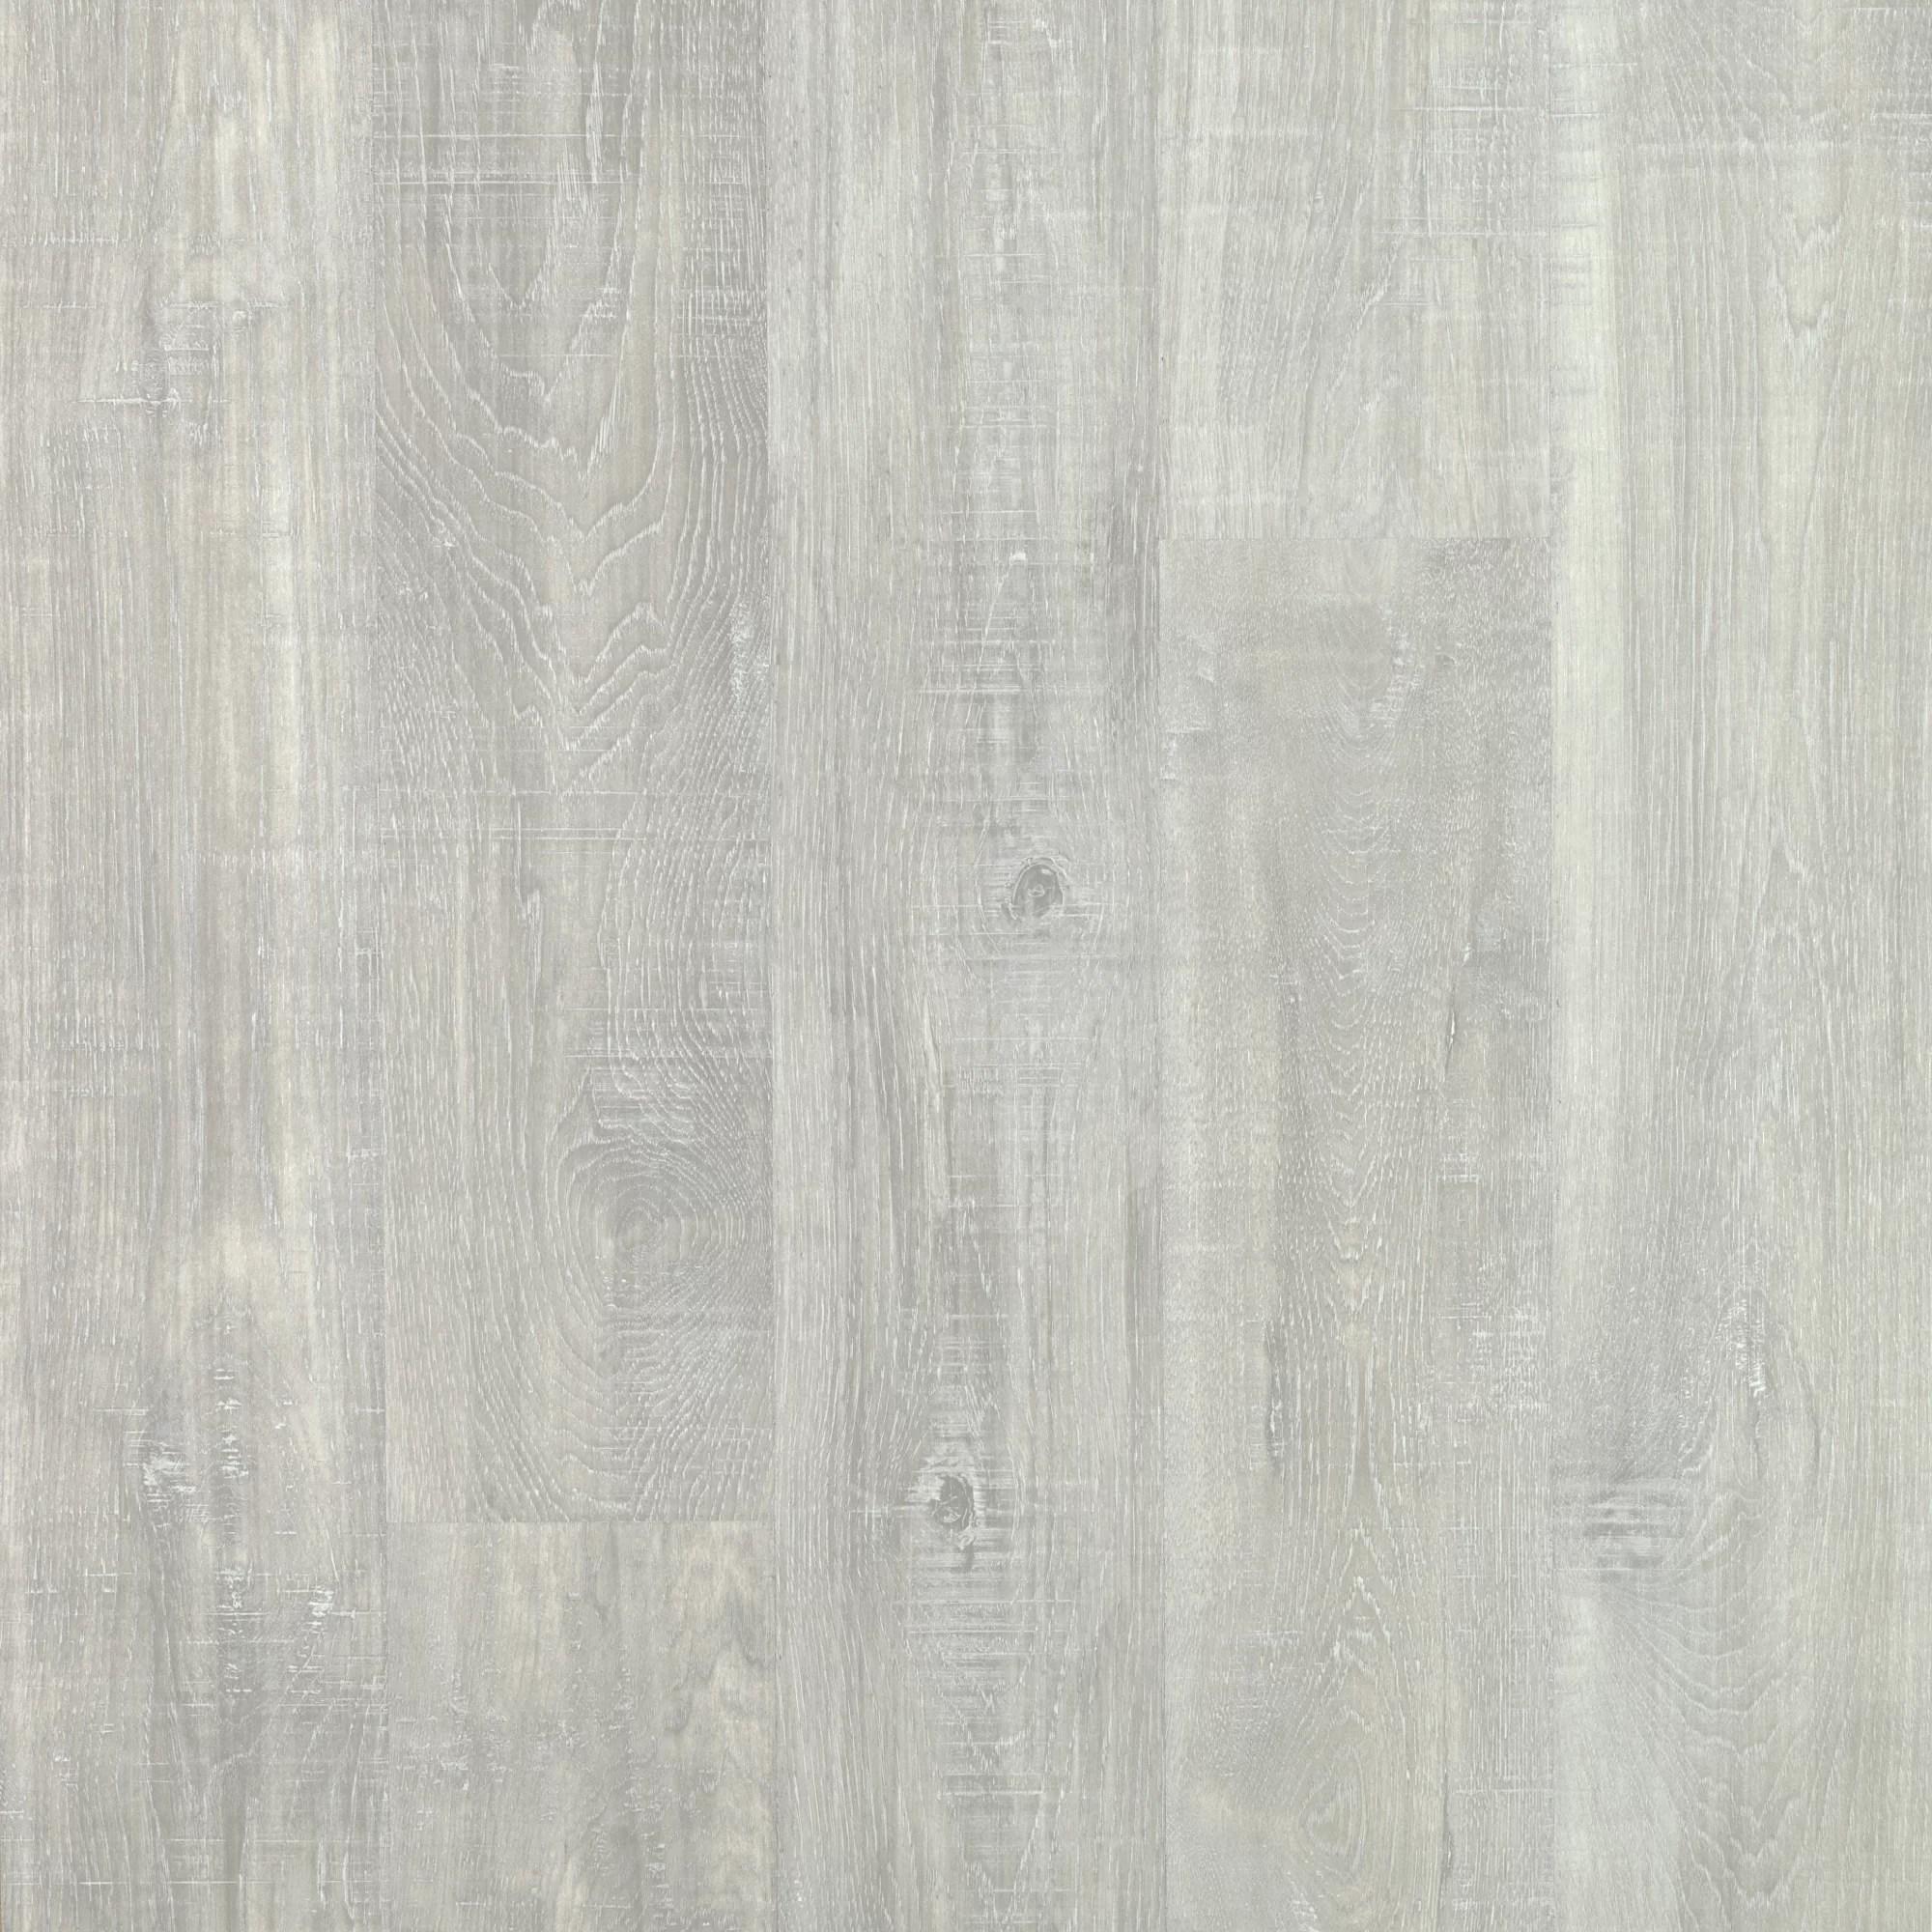 Quick Step Lavish 6 X 47 X 12mm Hickory Laminate Flooring